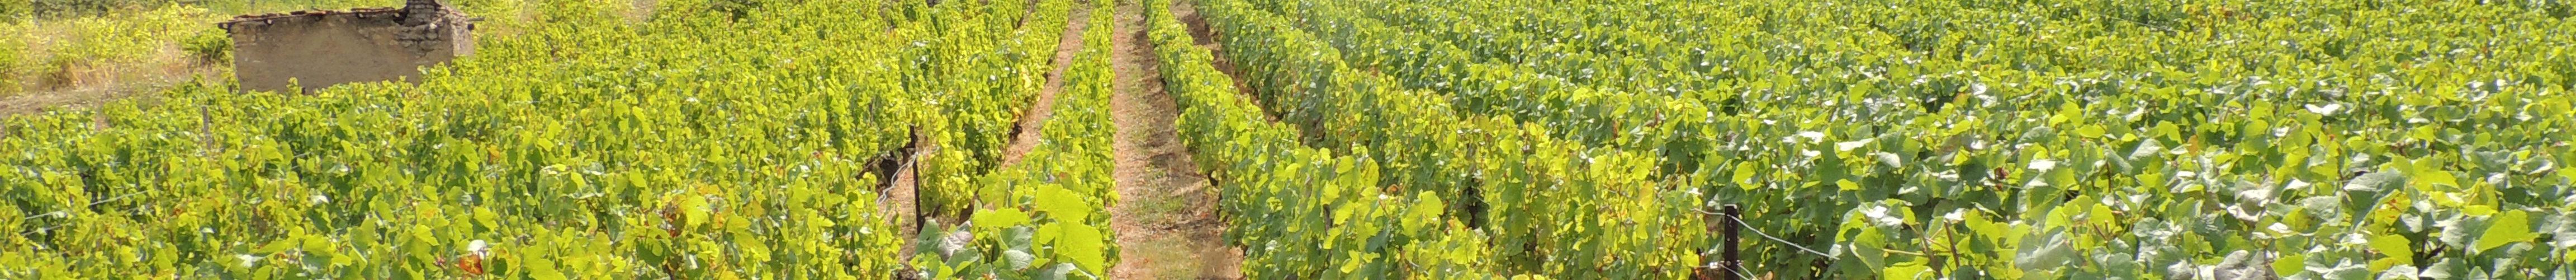 paysage vignoble de Bulligny